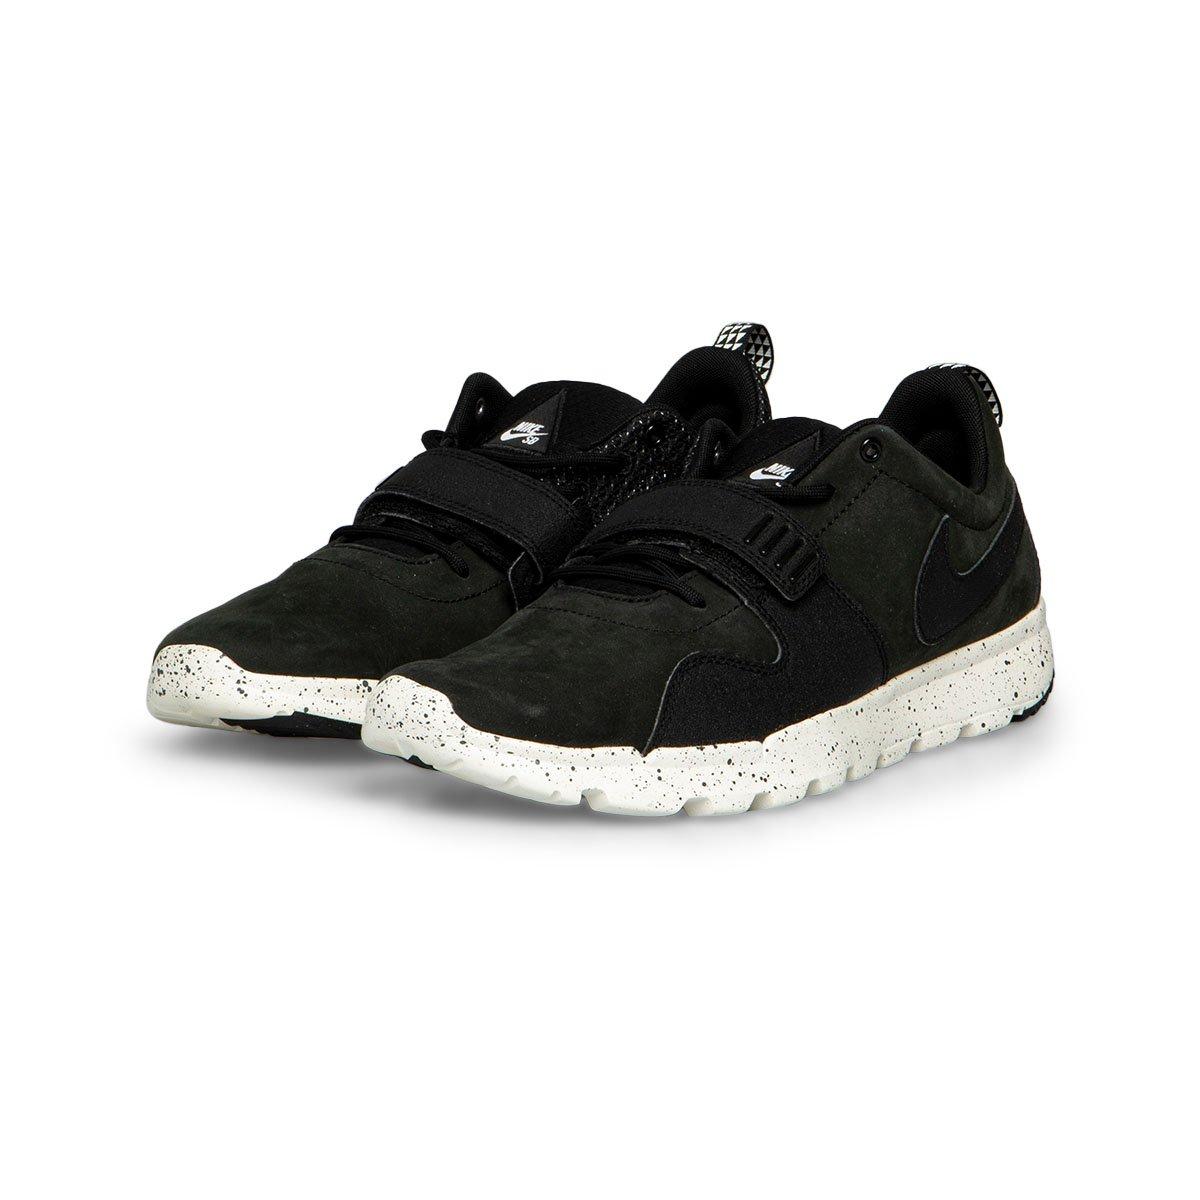 0166aaaf19d0 ... Nike SB Trainerendor black   black - clear jade - volt 616575-003 ...